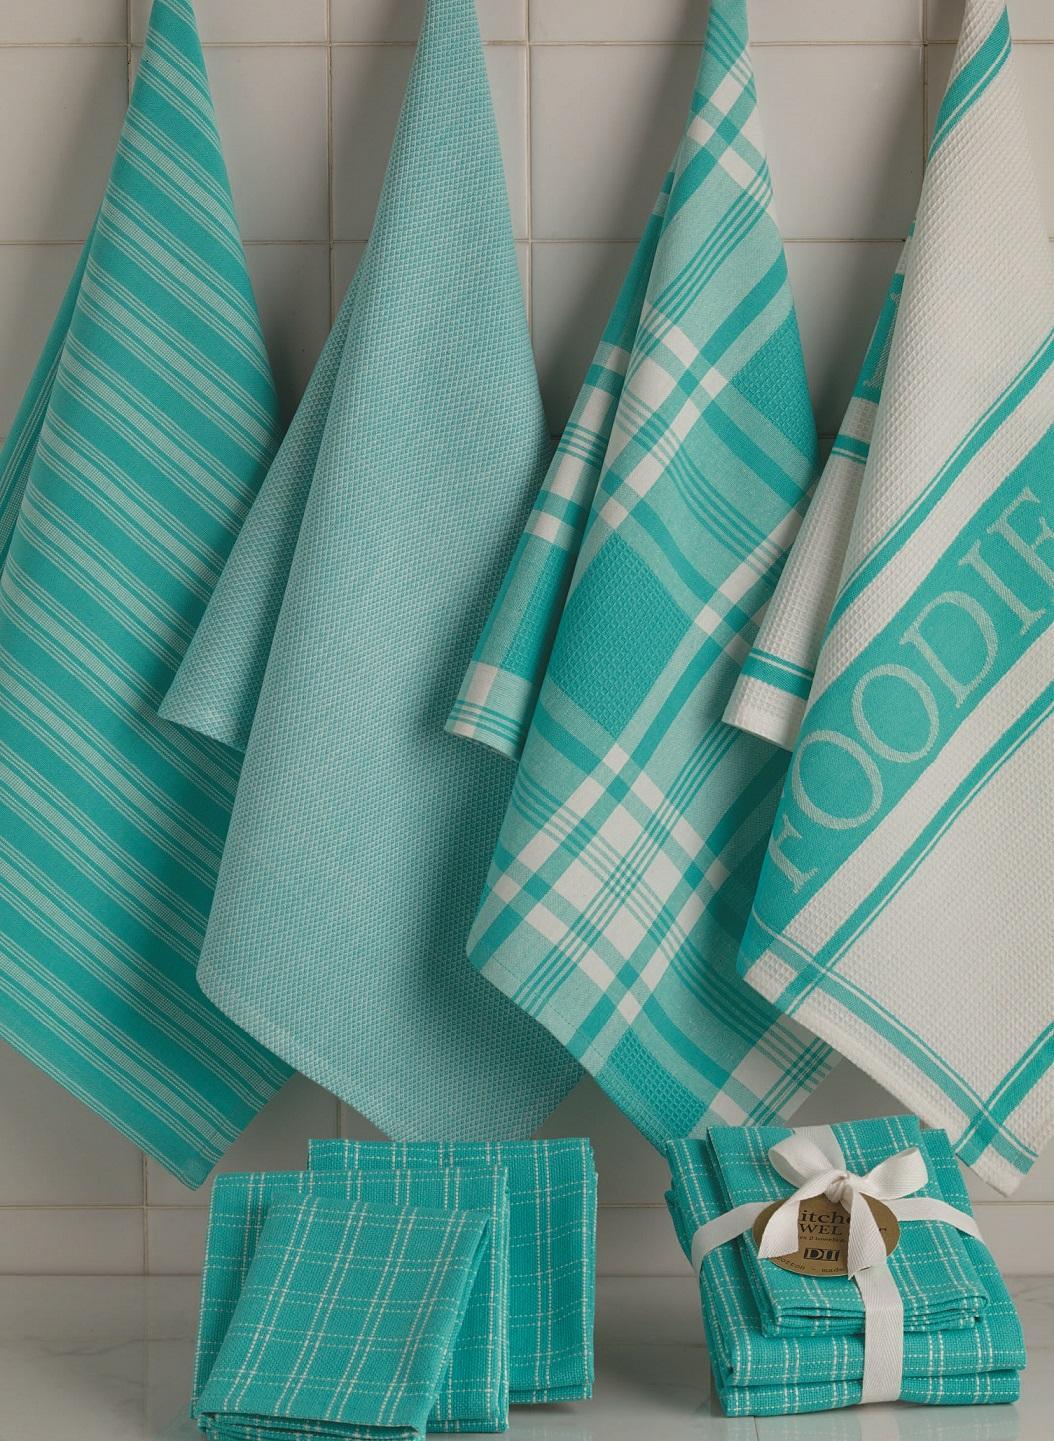 Amazon.com: DII Cotton Jacquard Dish Towels, 20x28 Set of 3 ...